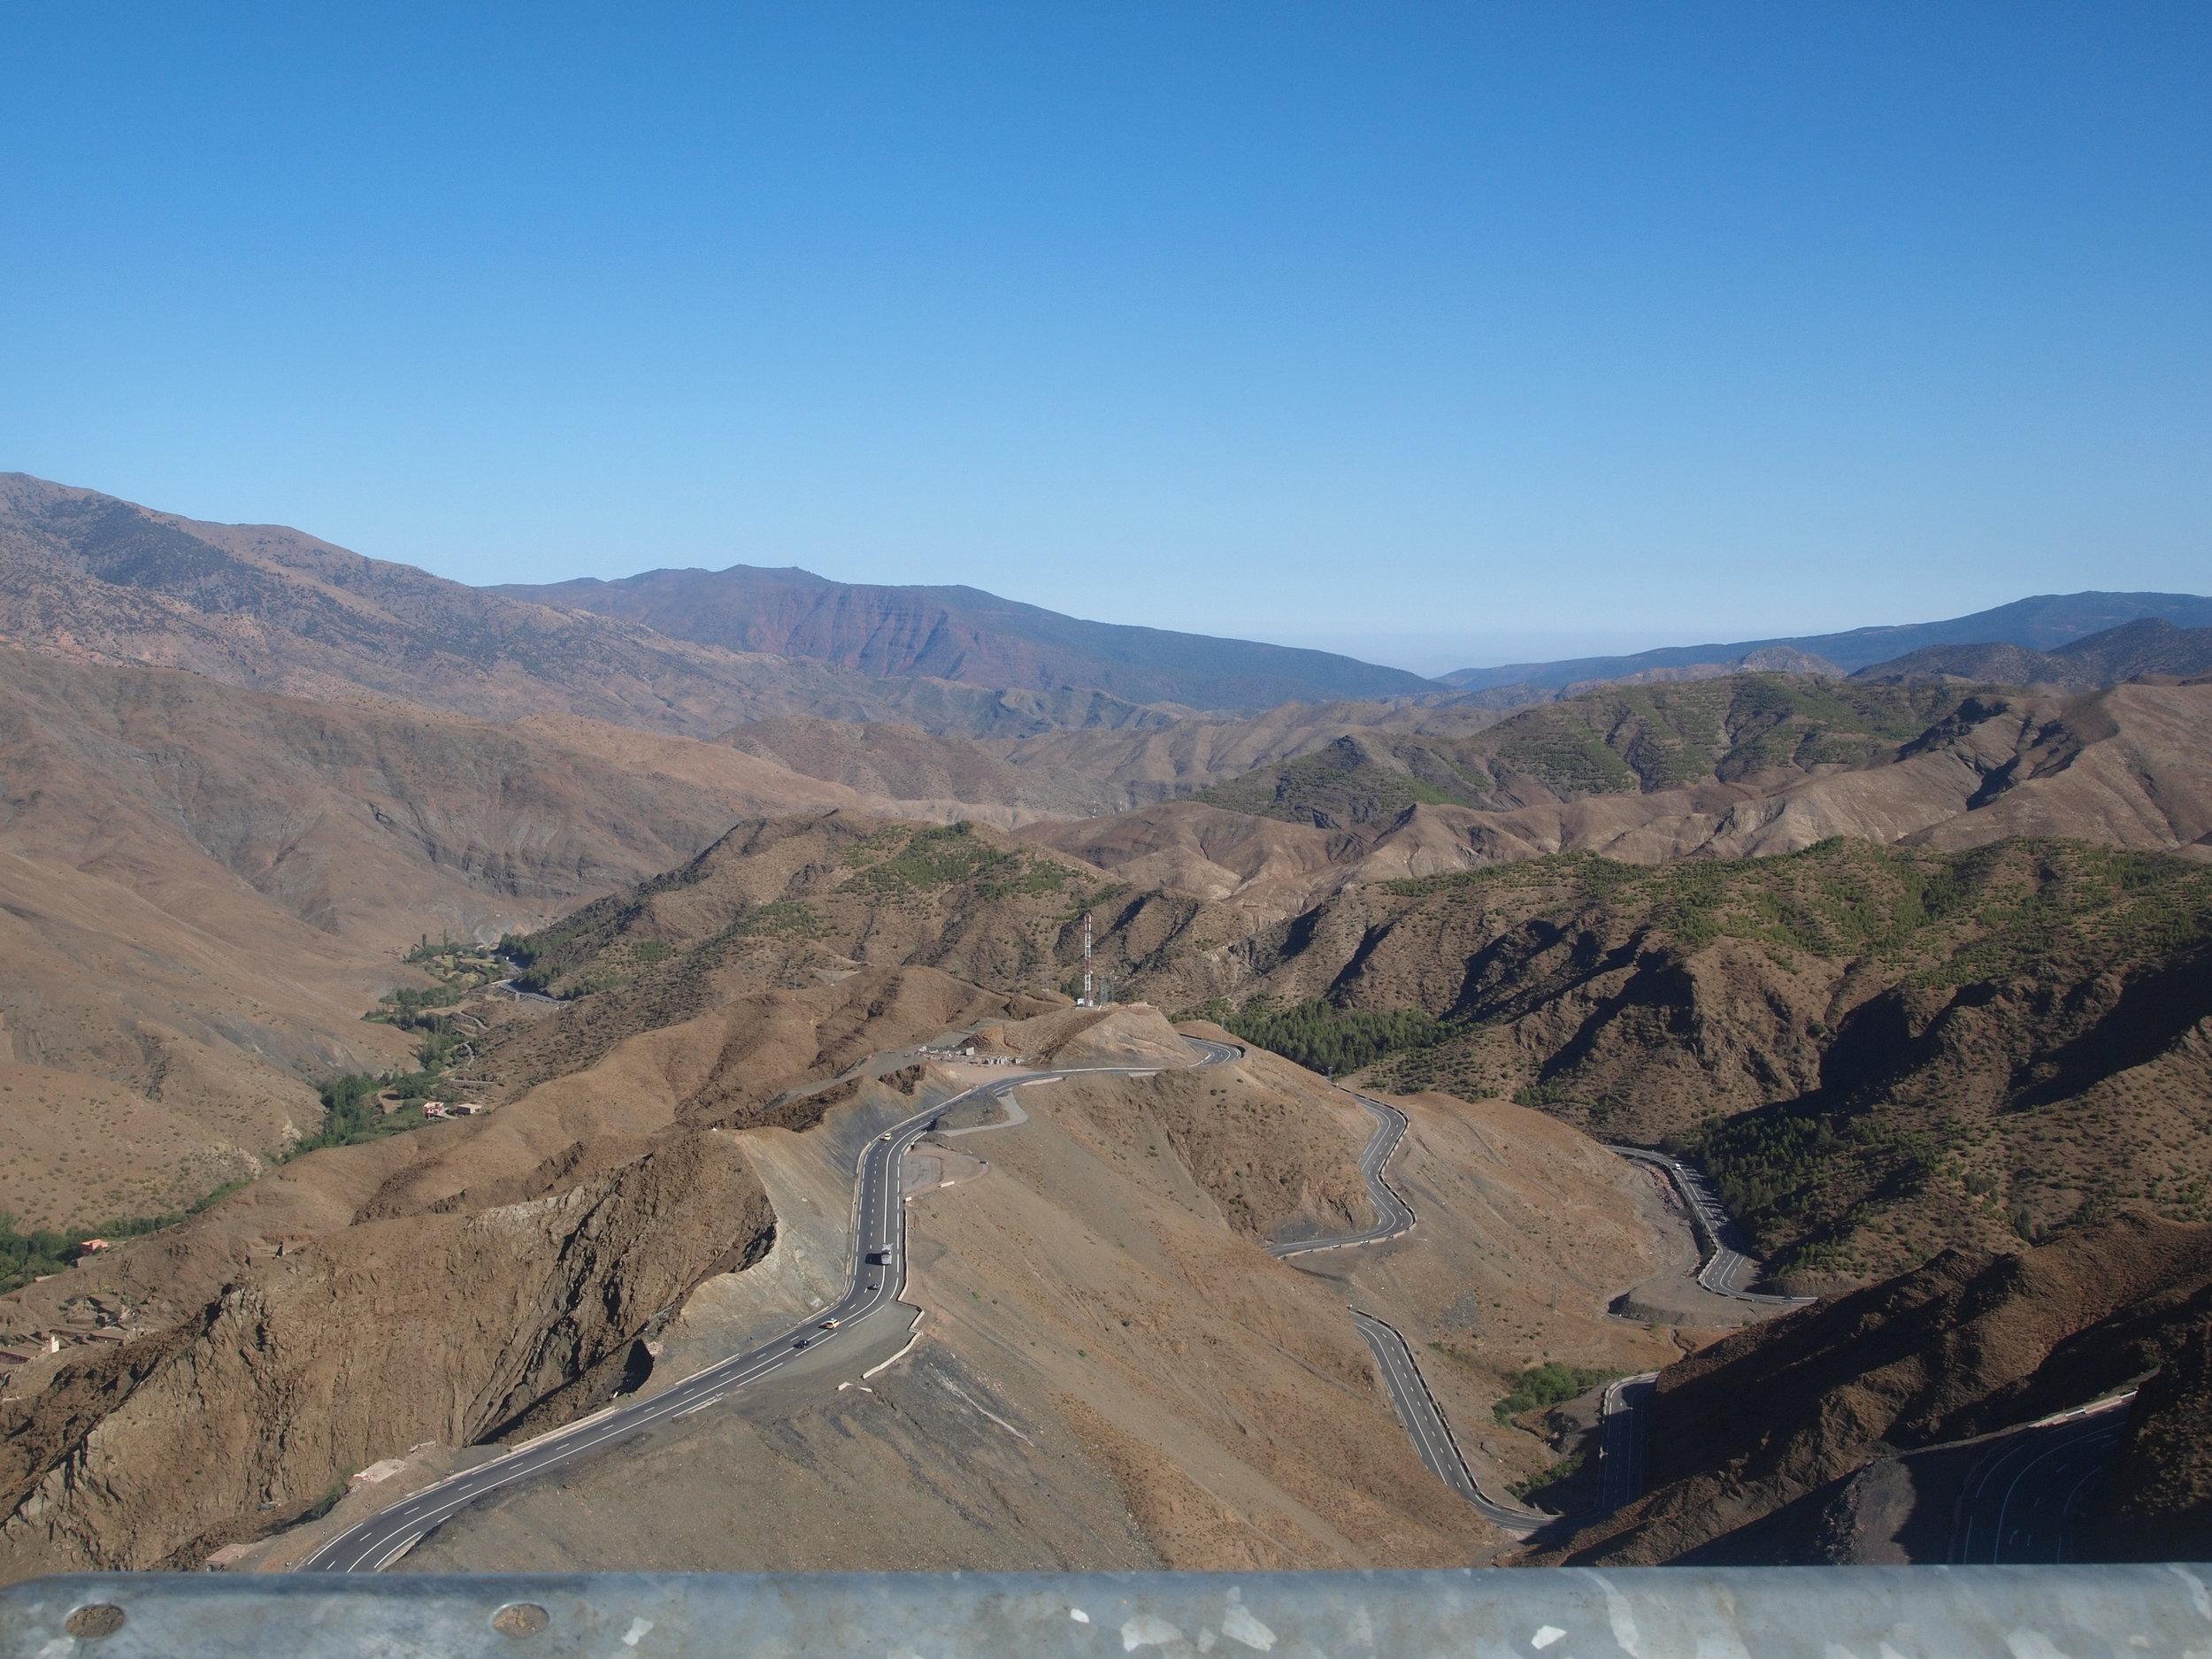 City: Zagora Desert  Atlas Mountains, crossing the Tizin Tichka pass at 2260m altitude